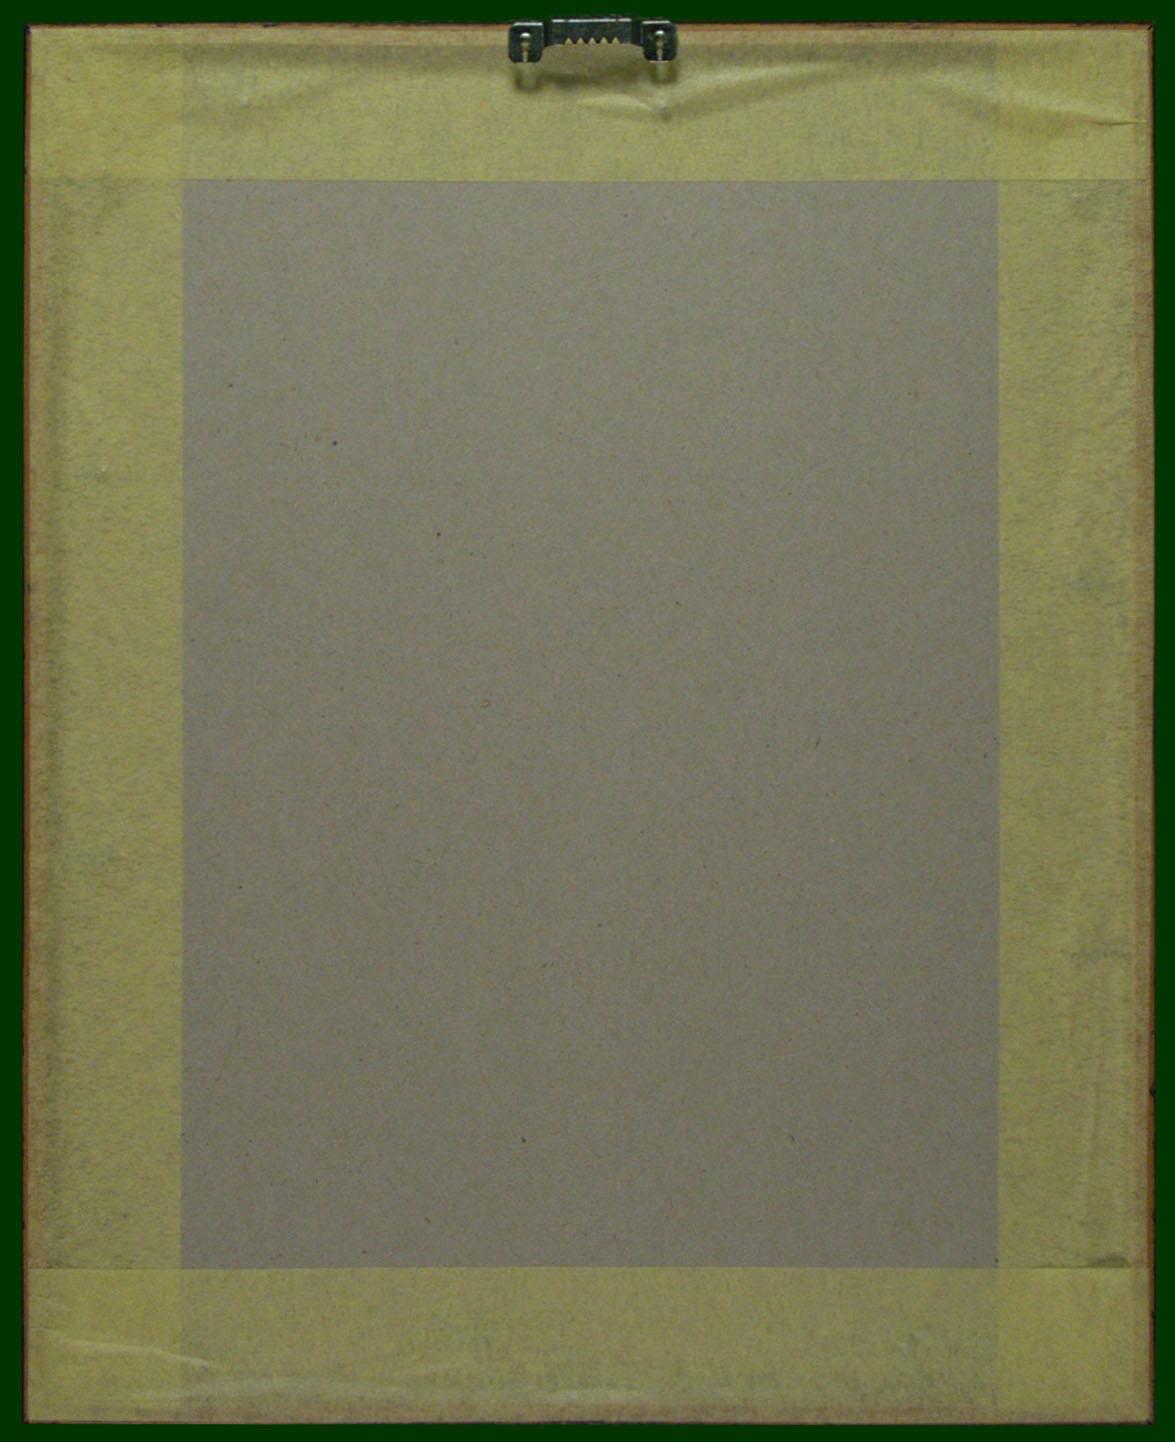 095-017h.JPG (1175×1442)